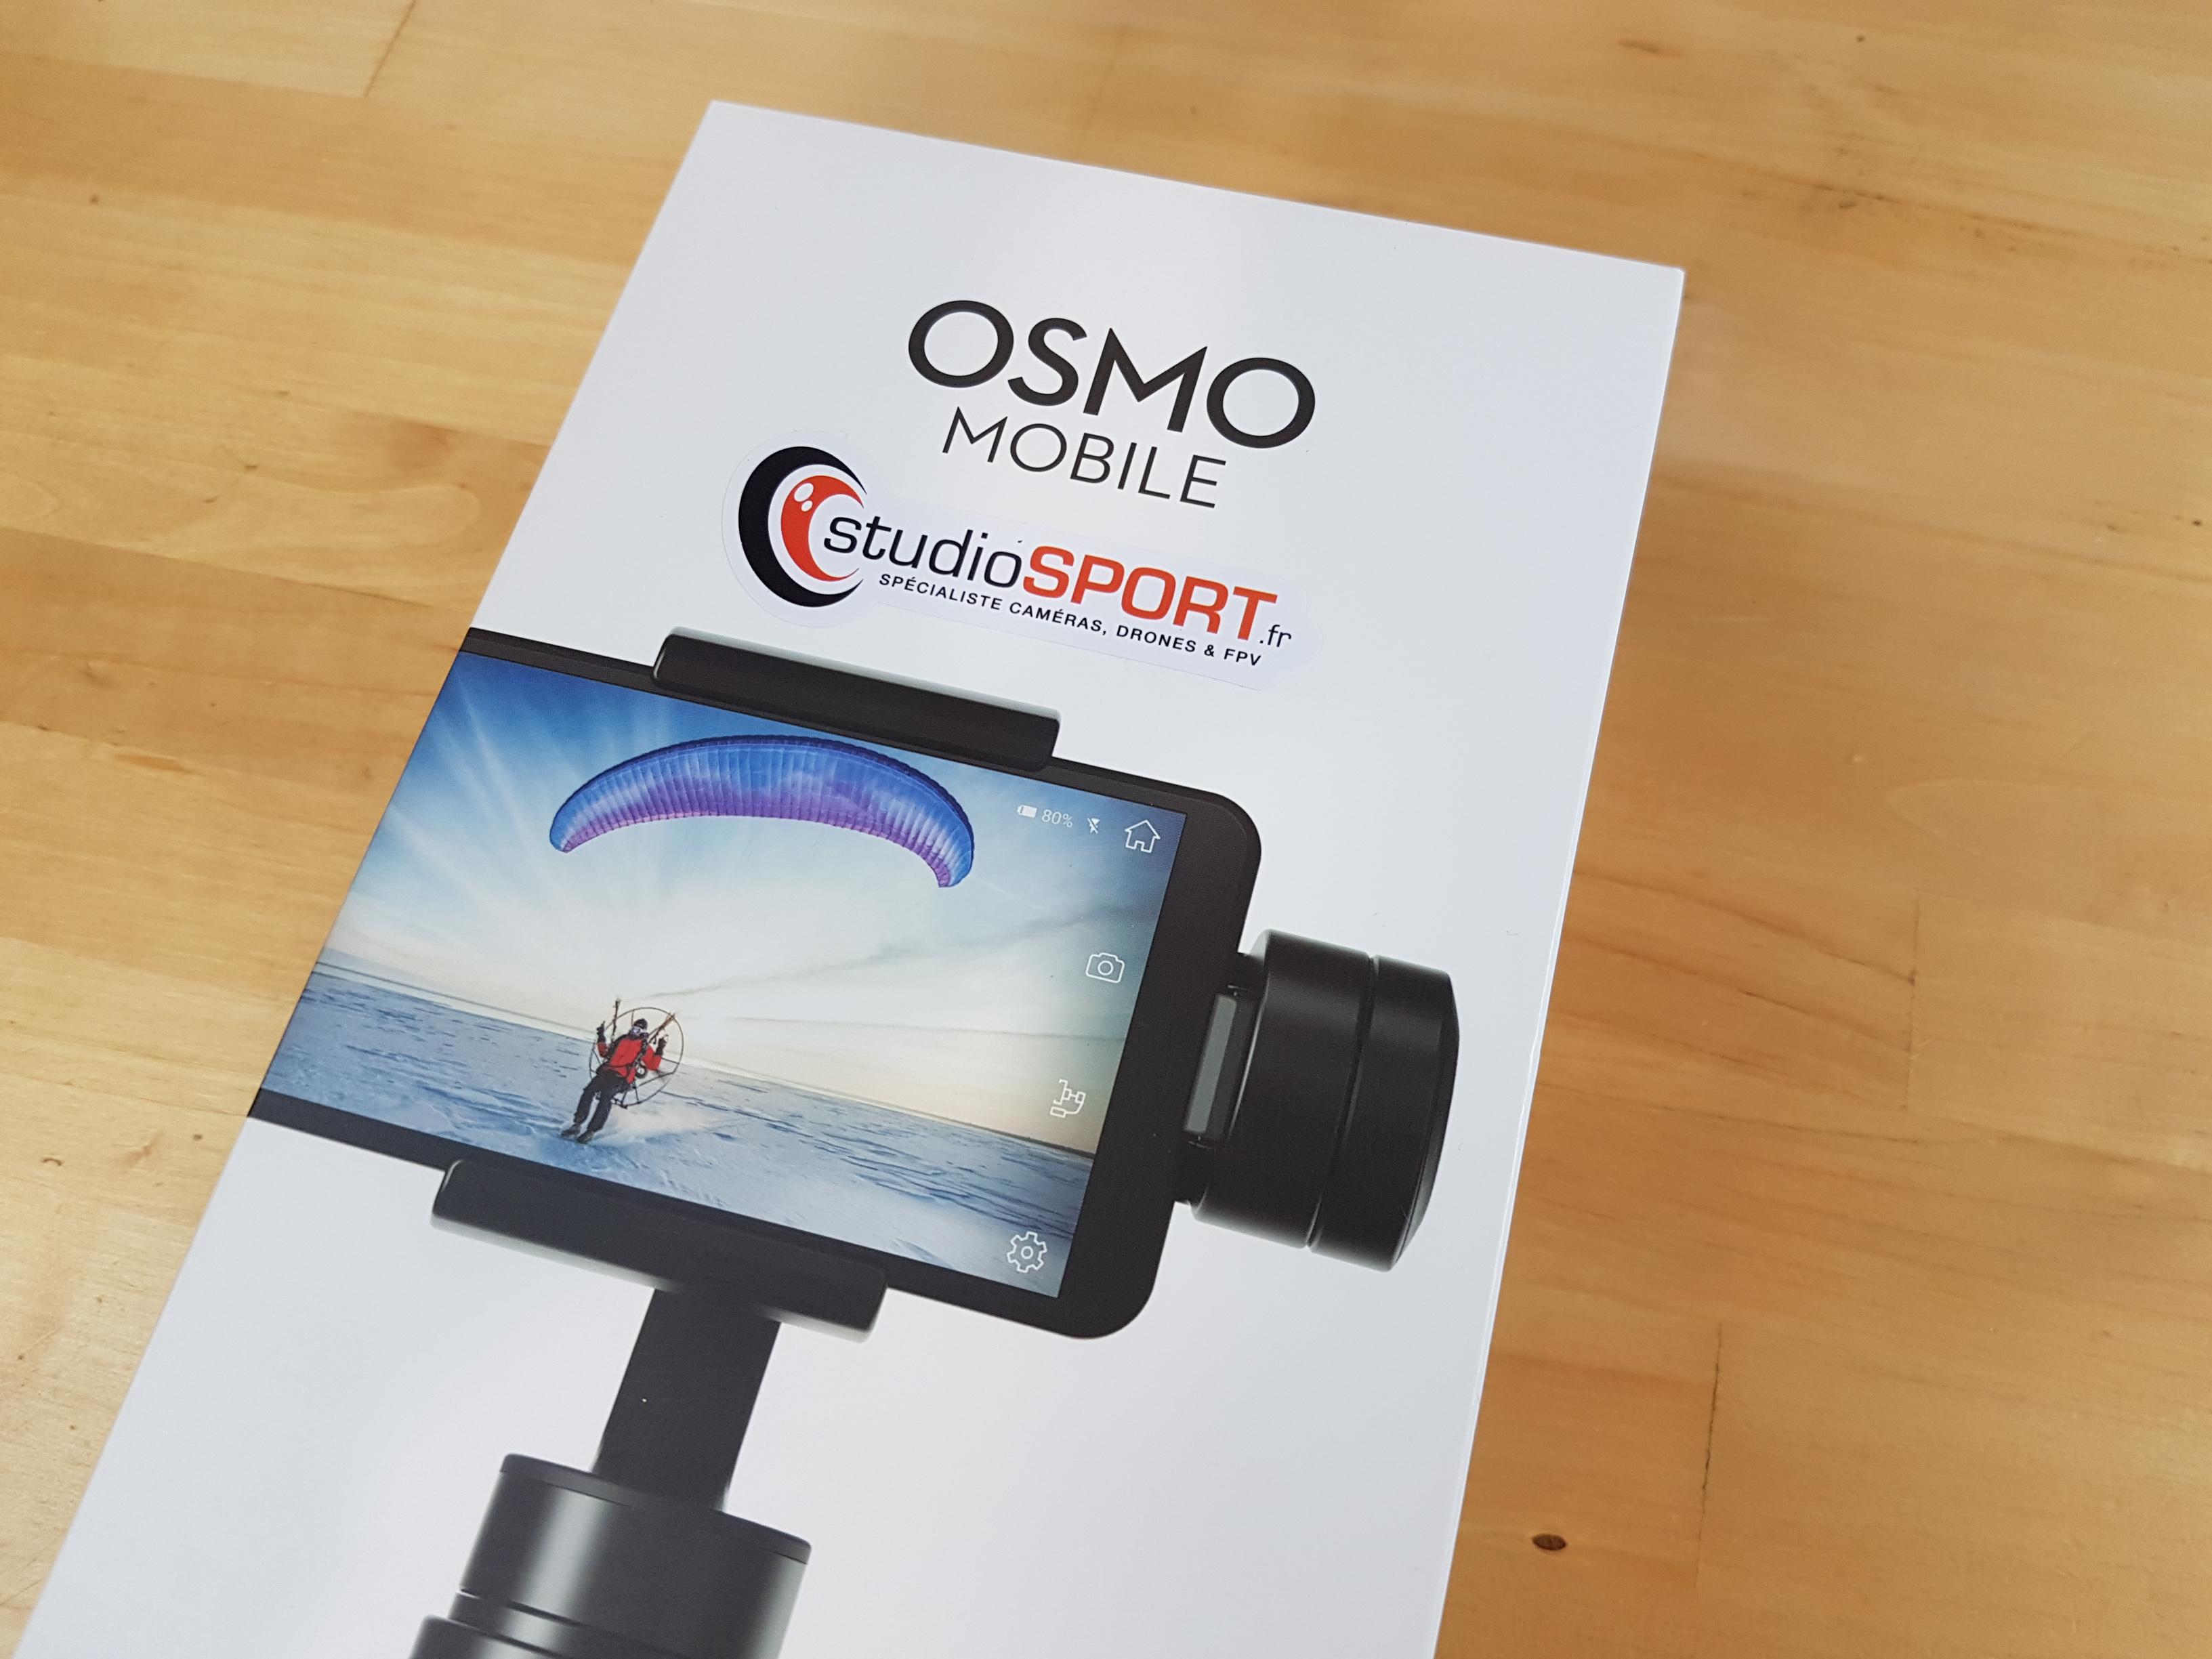 Test du DJI Osmo Mobile : un outil professionnel